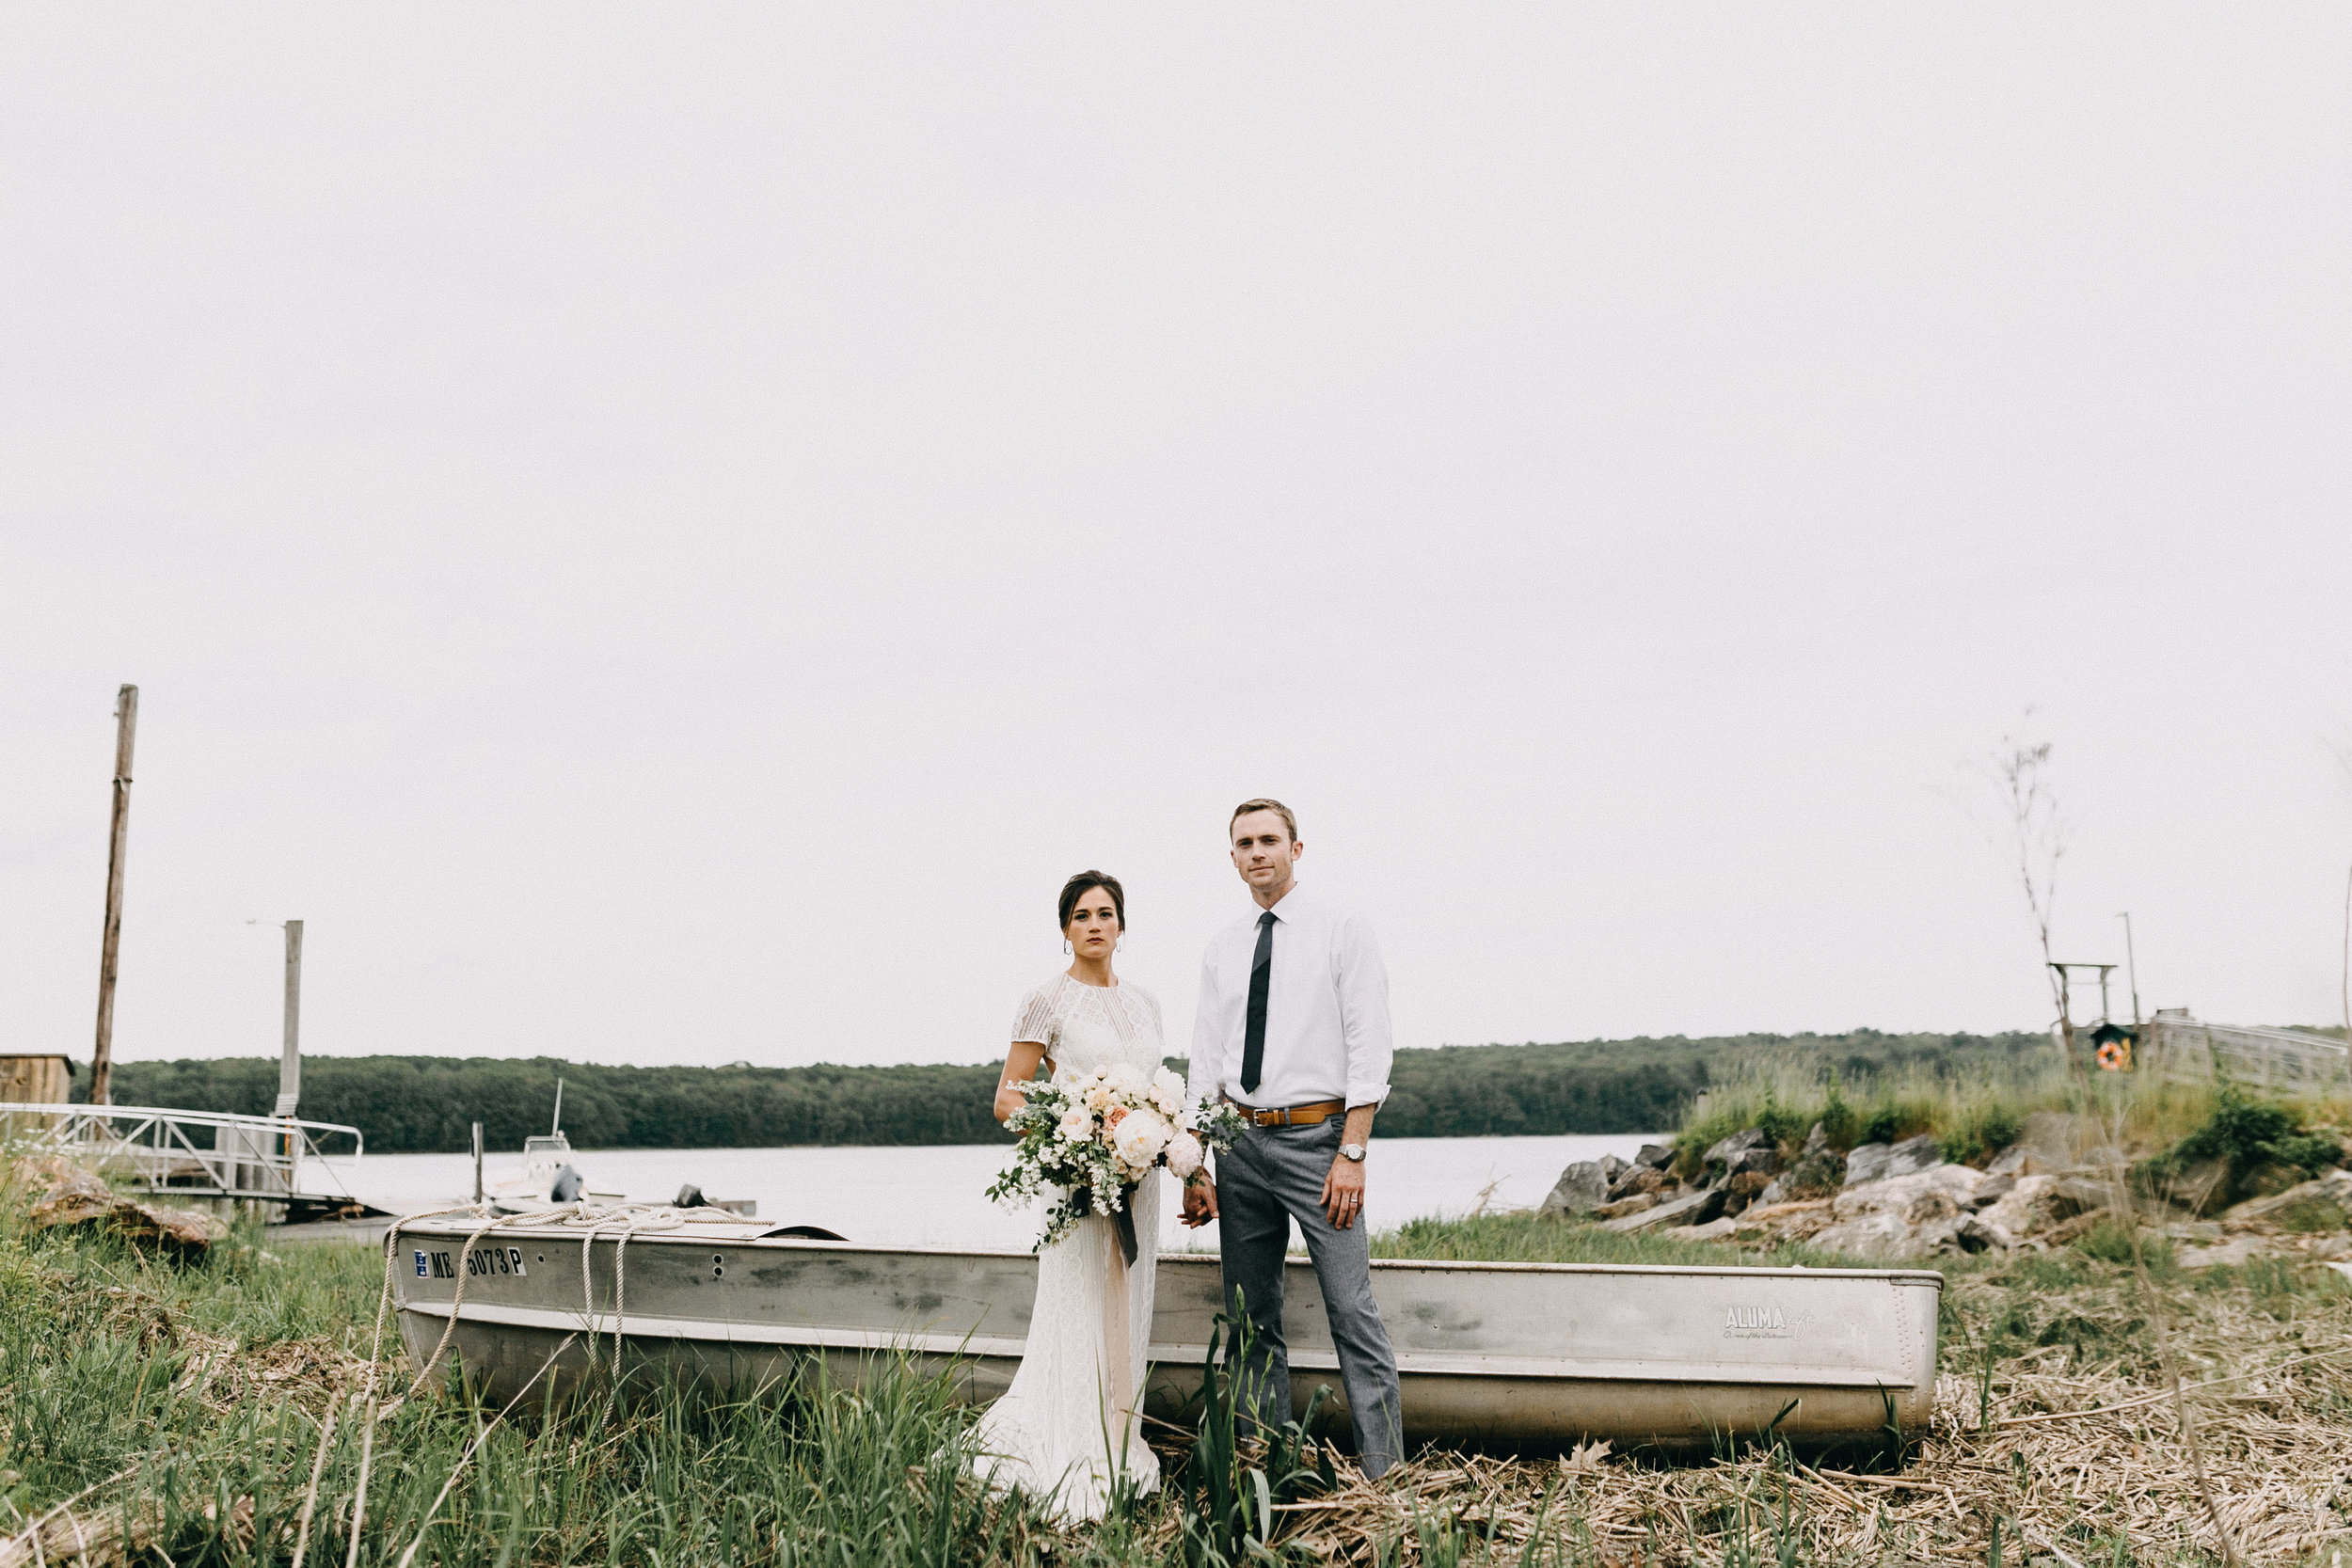 Watershed-Floral-Maine-Maritime-Wedding-Bridal-Bouquet-Centerpieces-0144.jpg